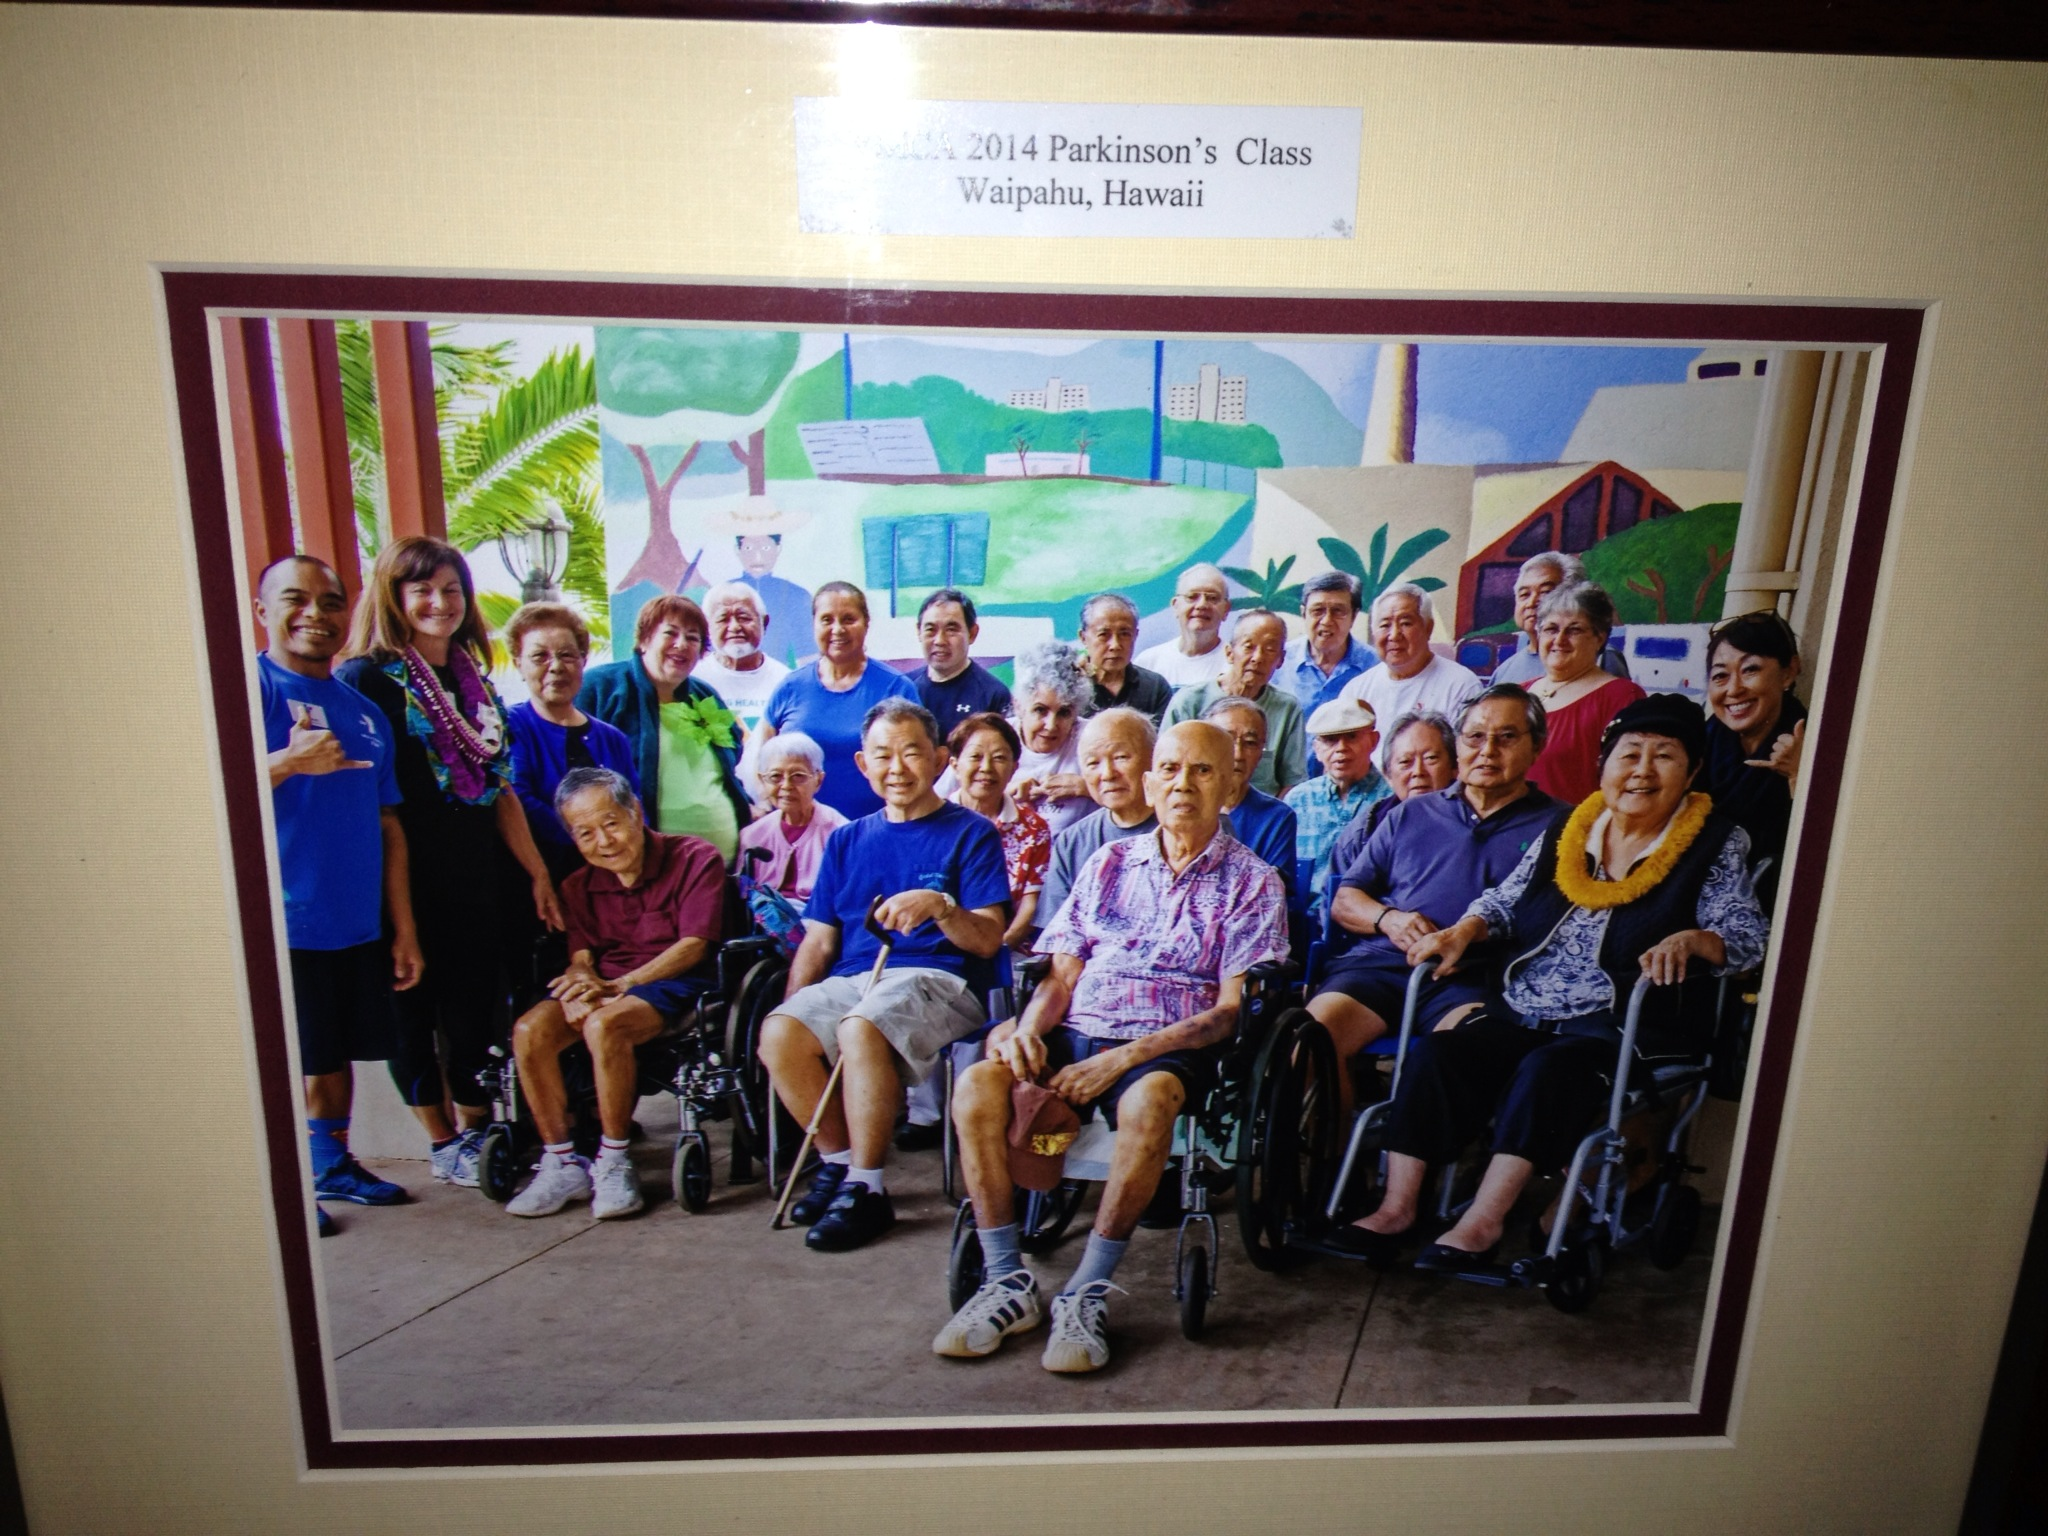 Parkinson's Class - Waipahu, Hawaii